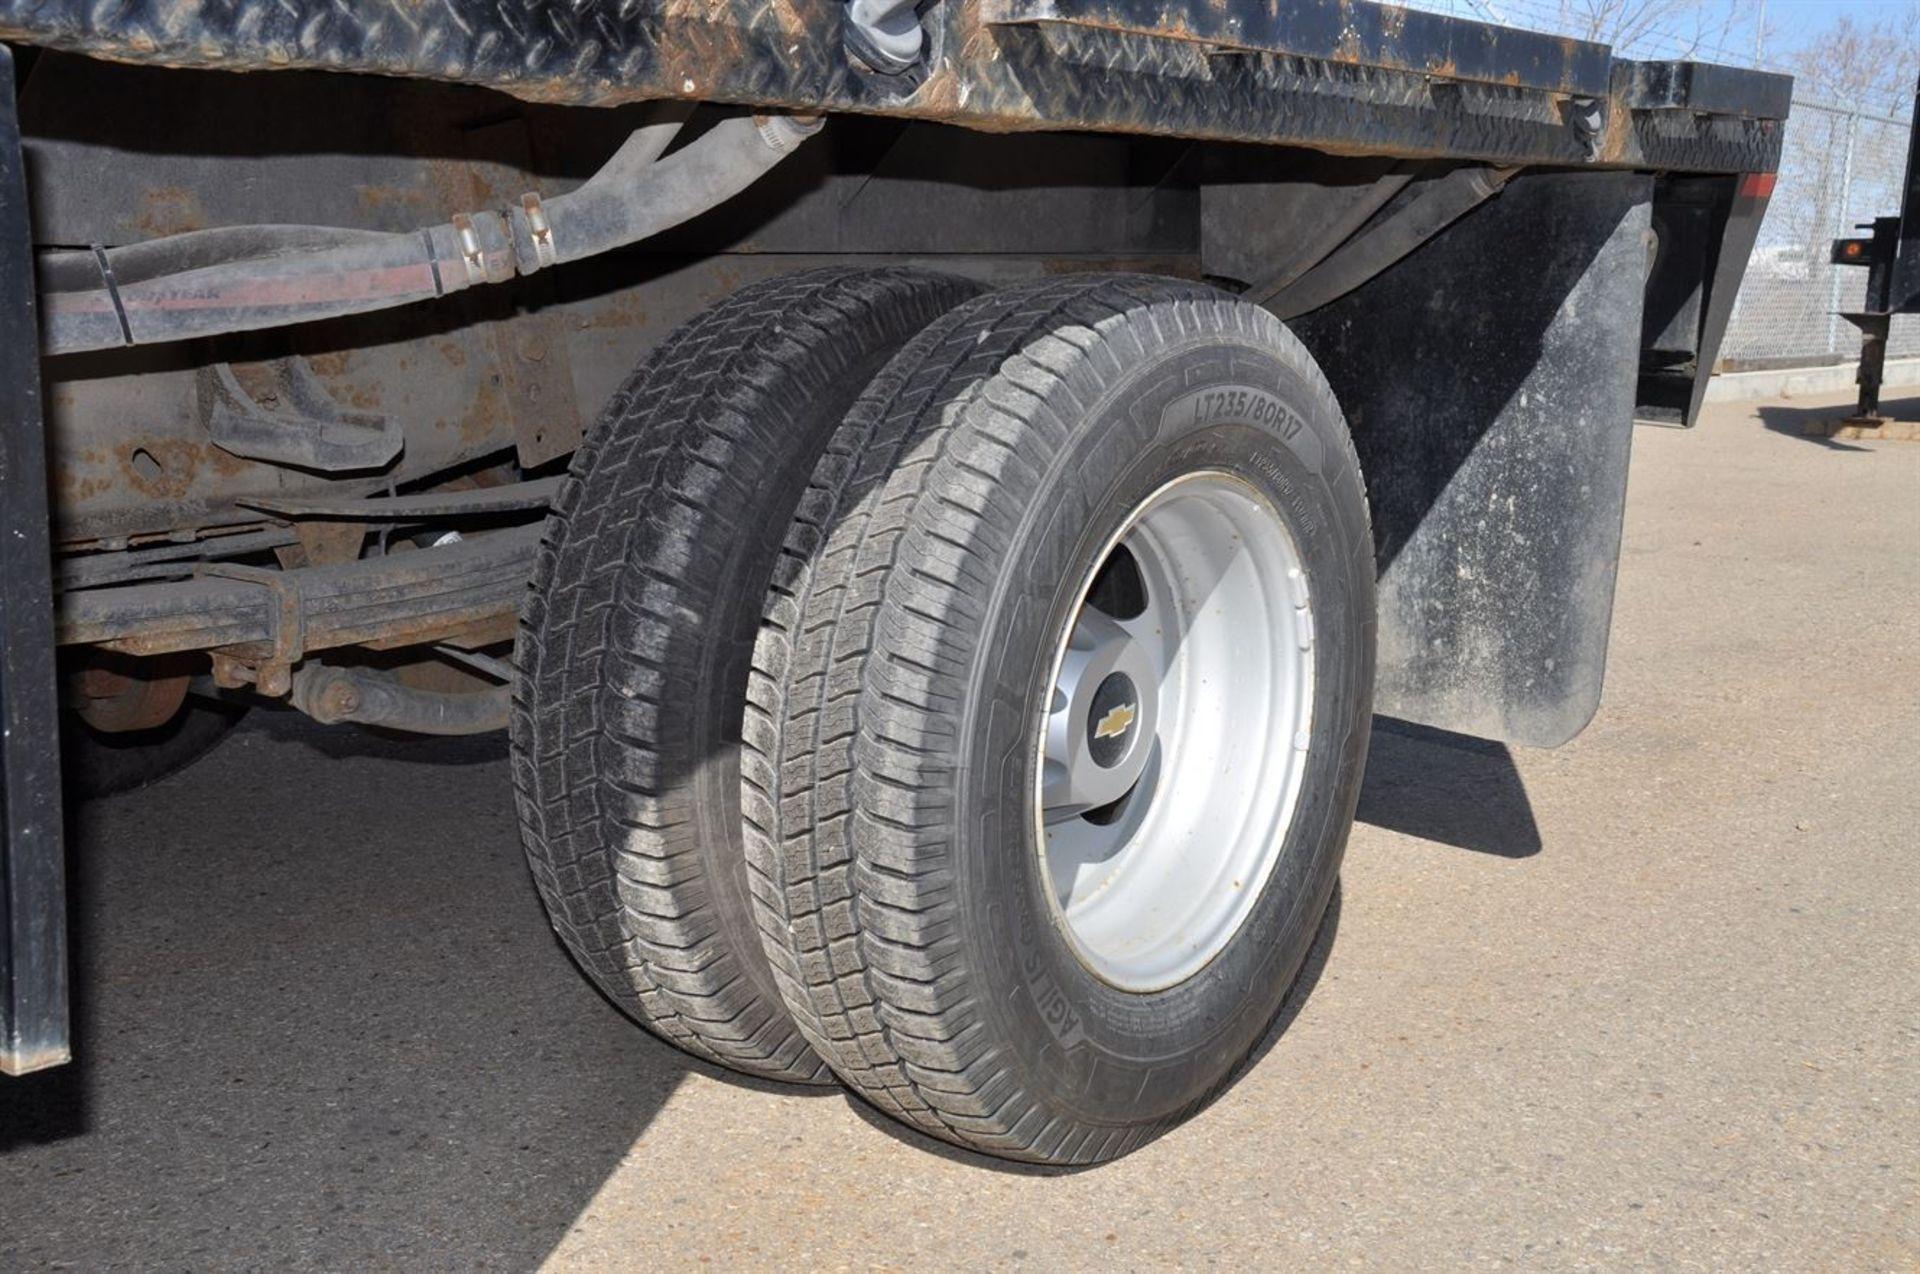 2012 CHEVROLET SILVERADO 3500 HD Flat Deck Dually Truck, VIN 1GB3KZCGXCF155813, w/ VORTEX Engine, - Image 8 of 9